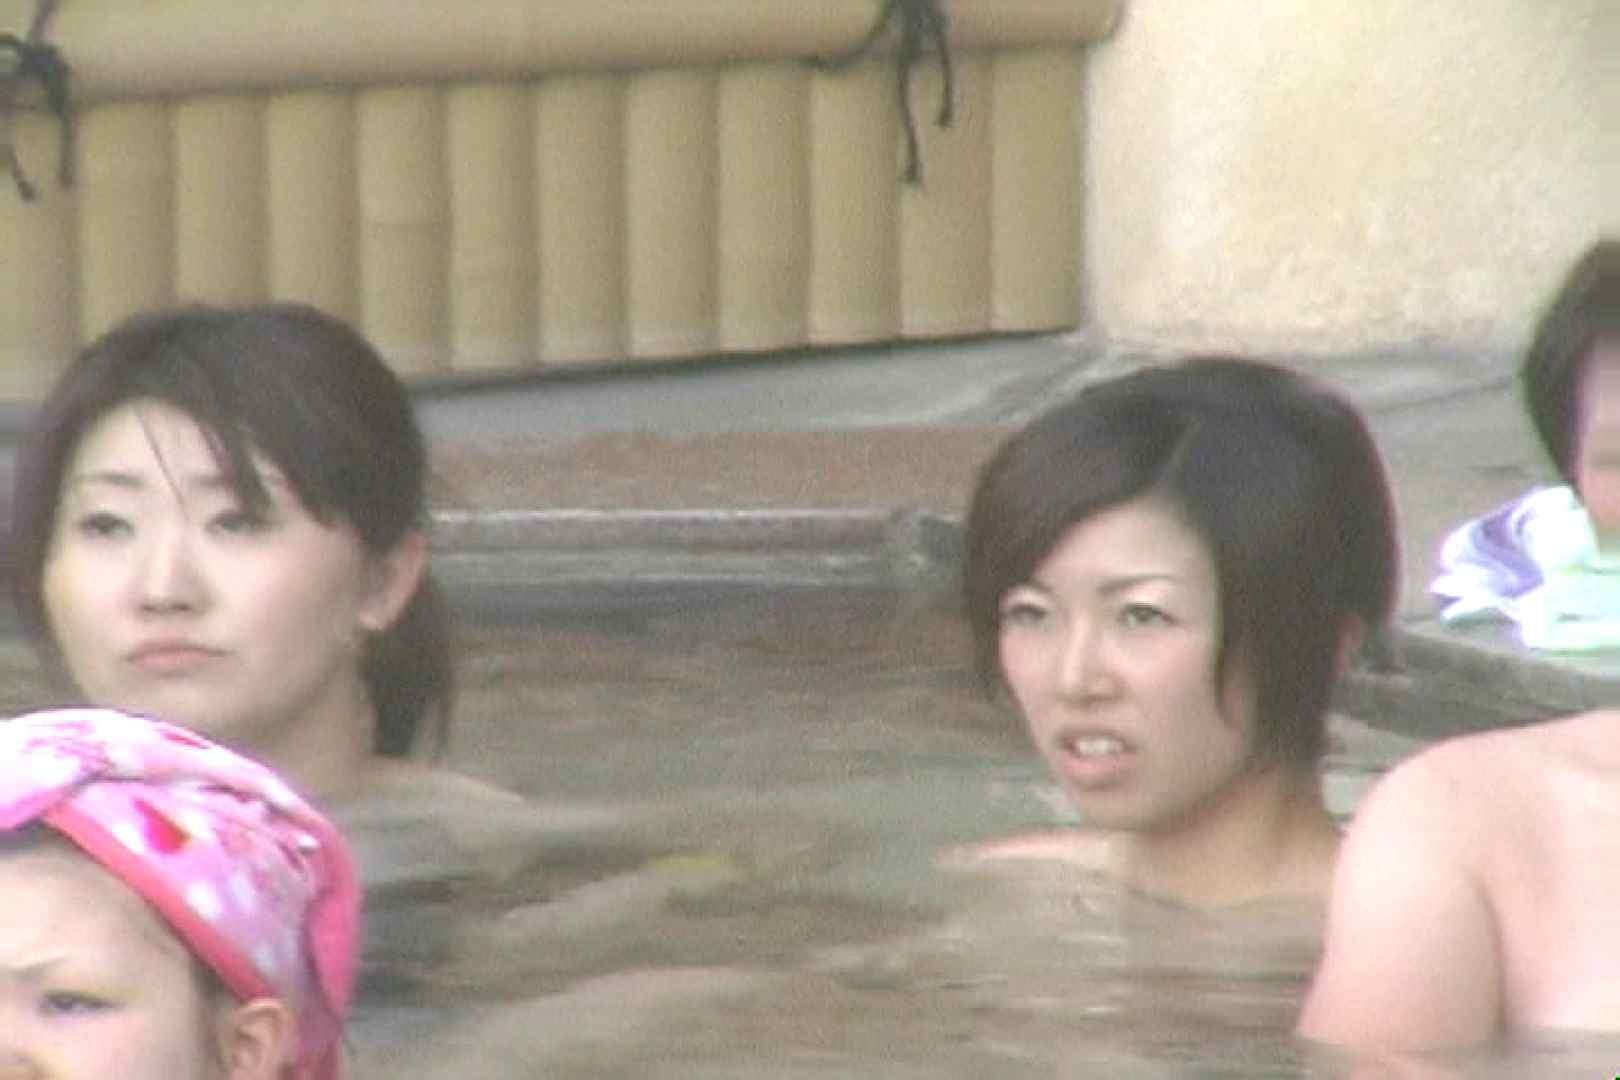 Aquaな露天風呂Vol.25 露天風呂編  91PIX 32